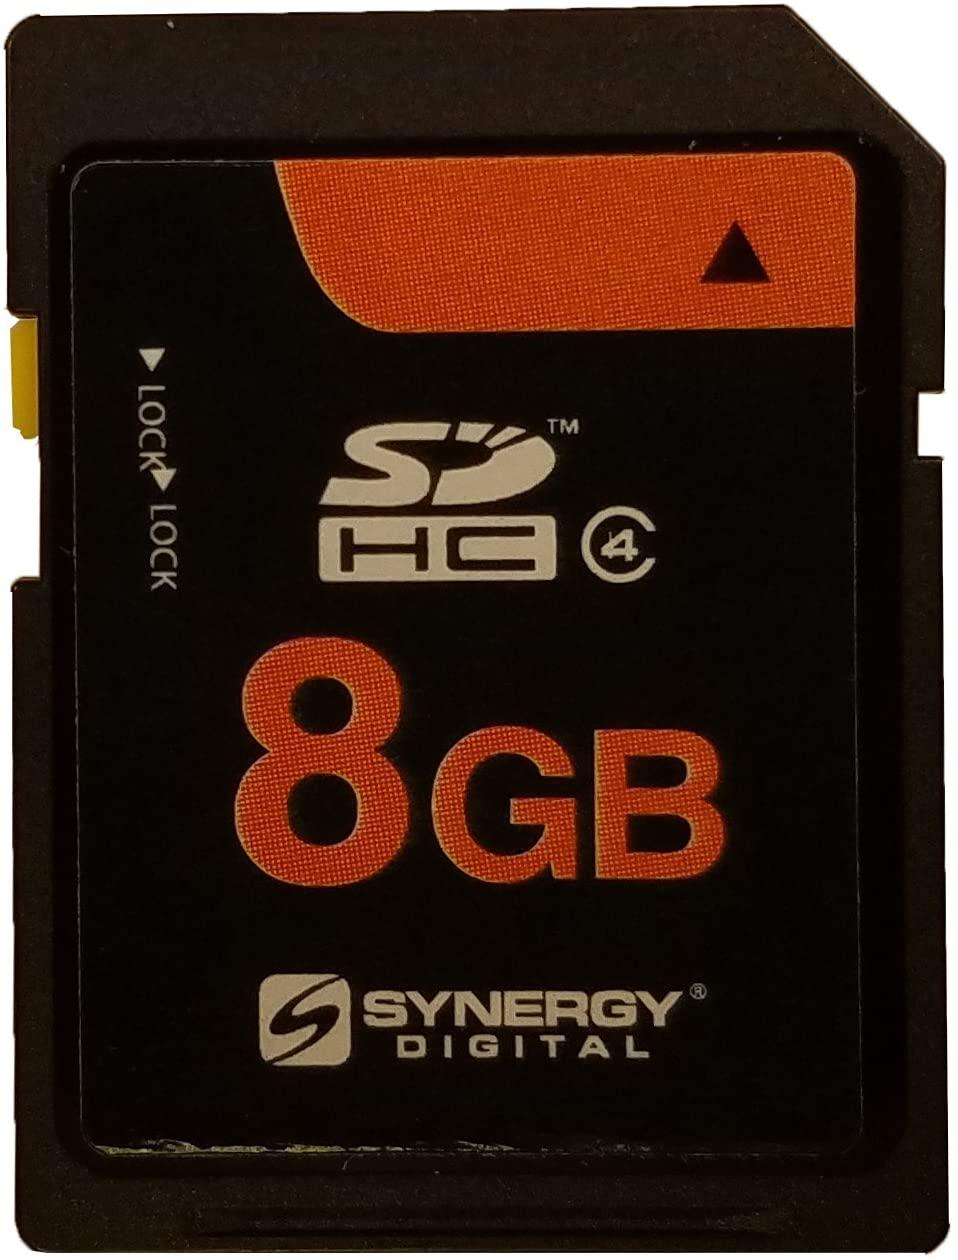 Canon Powershot A720 is Digital Camera Memory Card 8GB Secure Digital High Capacity (SDHC) Memory Card